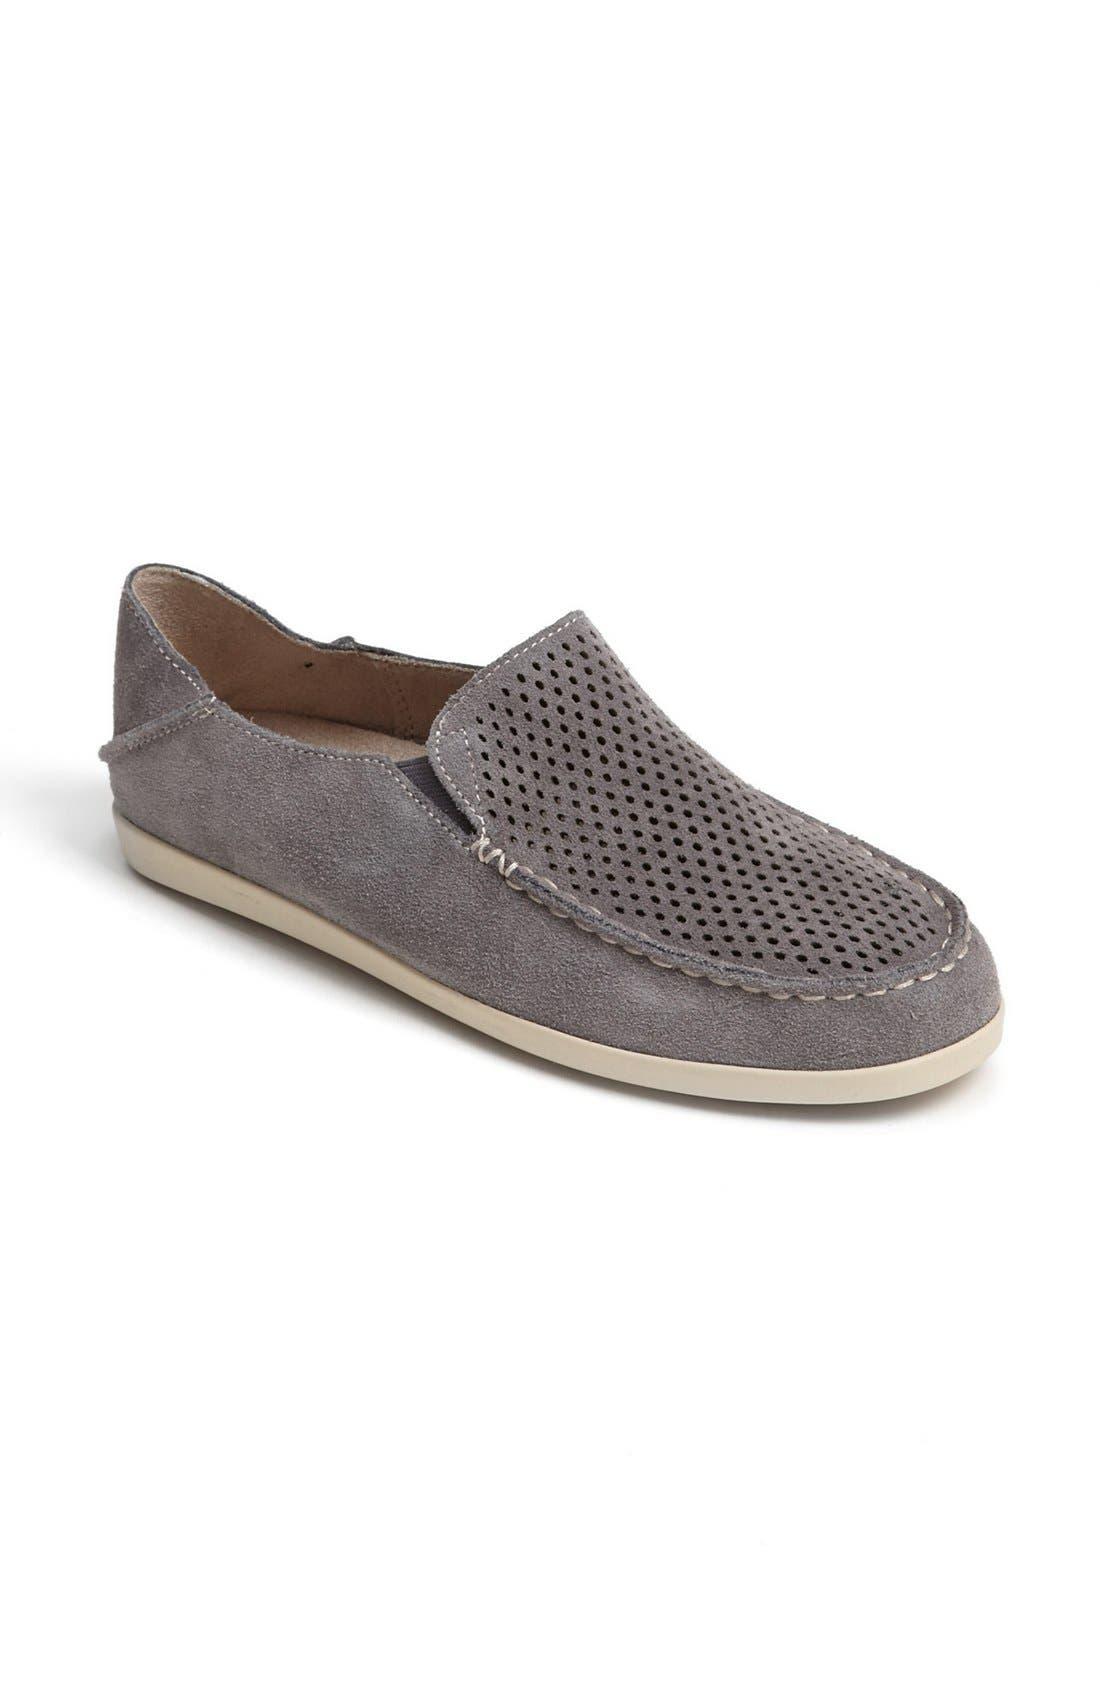 Main Image - OluKai 'Nohea' Sneaker